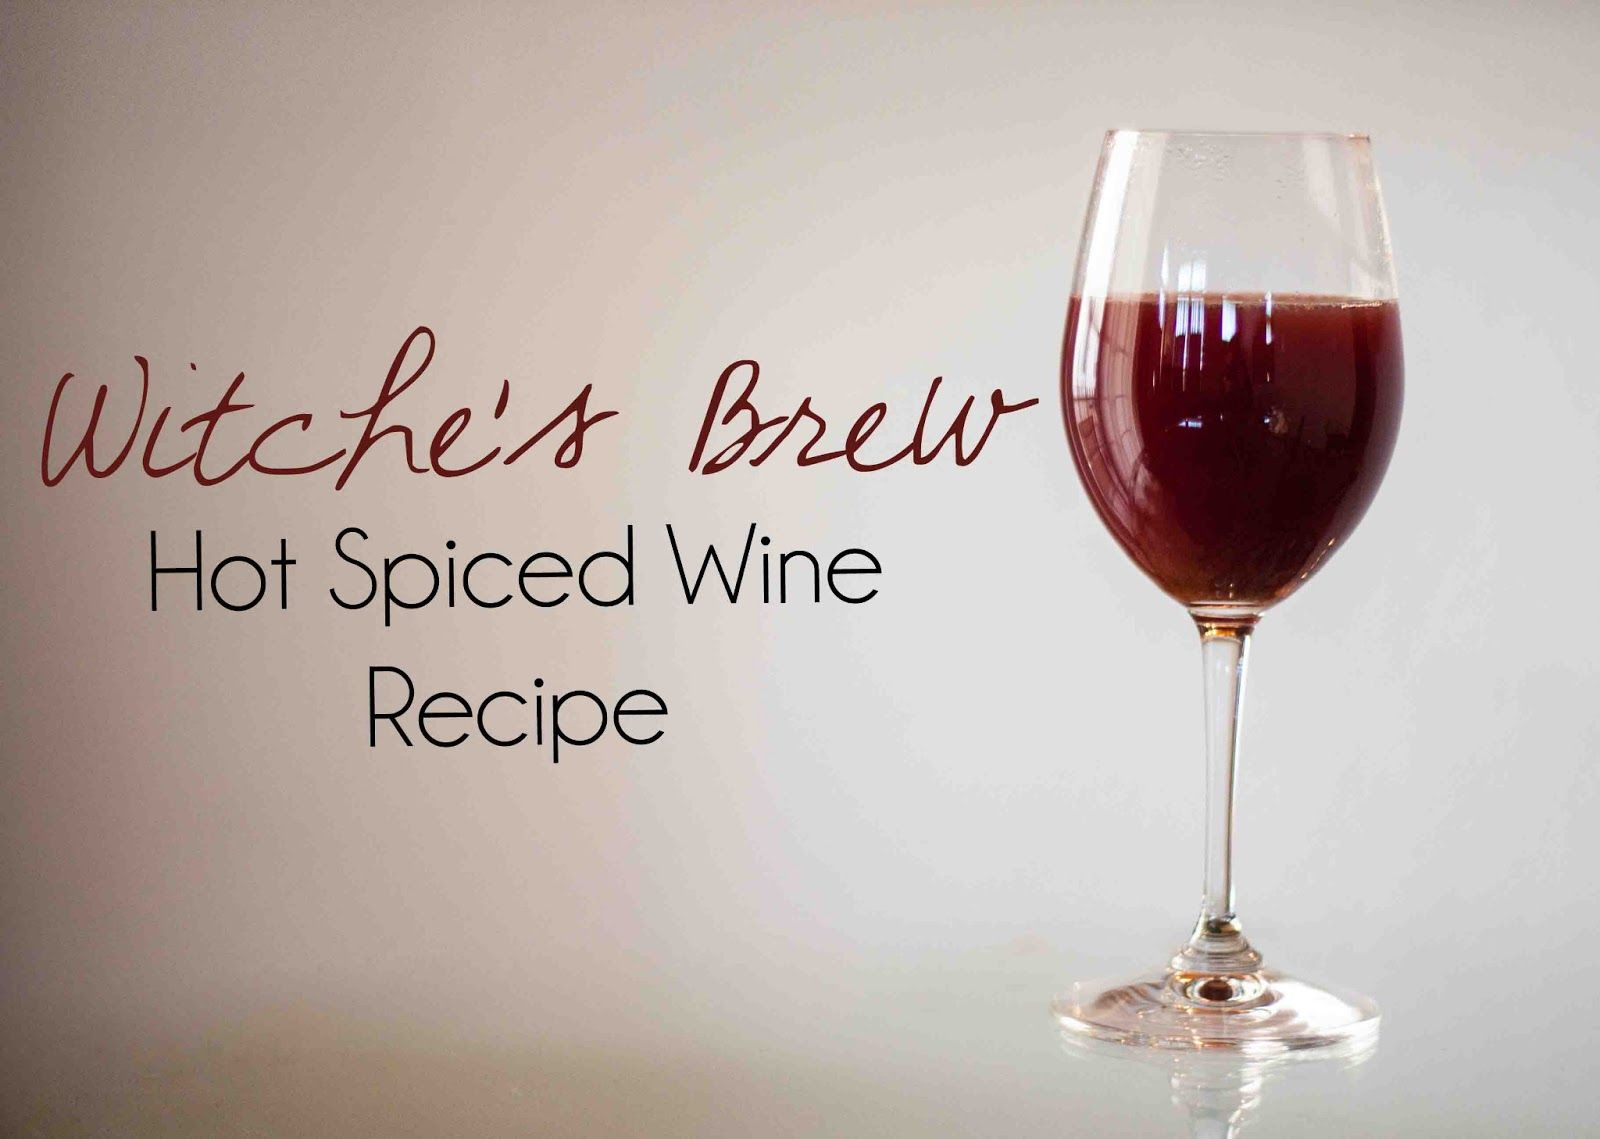 Witch S Brew Hot Spiced Wine Recipe 4 Cups Water 1 Cup Oj 1 Apple Sliced 1 Cup Lemon Ju Wine Recipes Spiced Wine Recipe Halloween Recipes Drinks